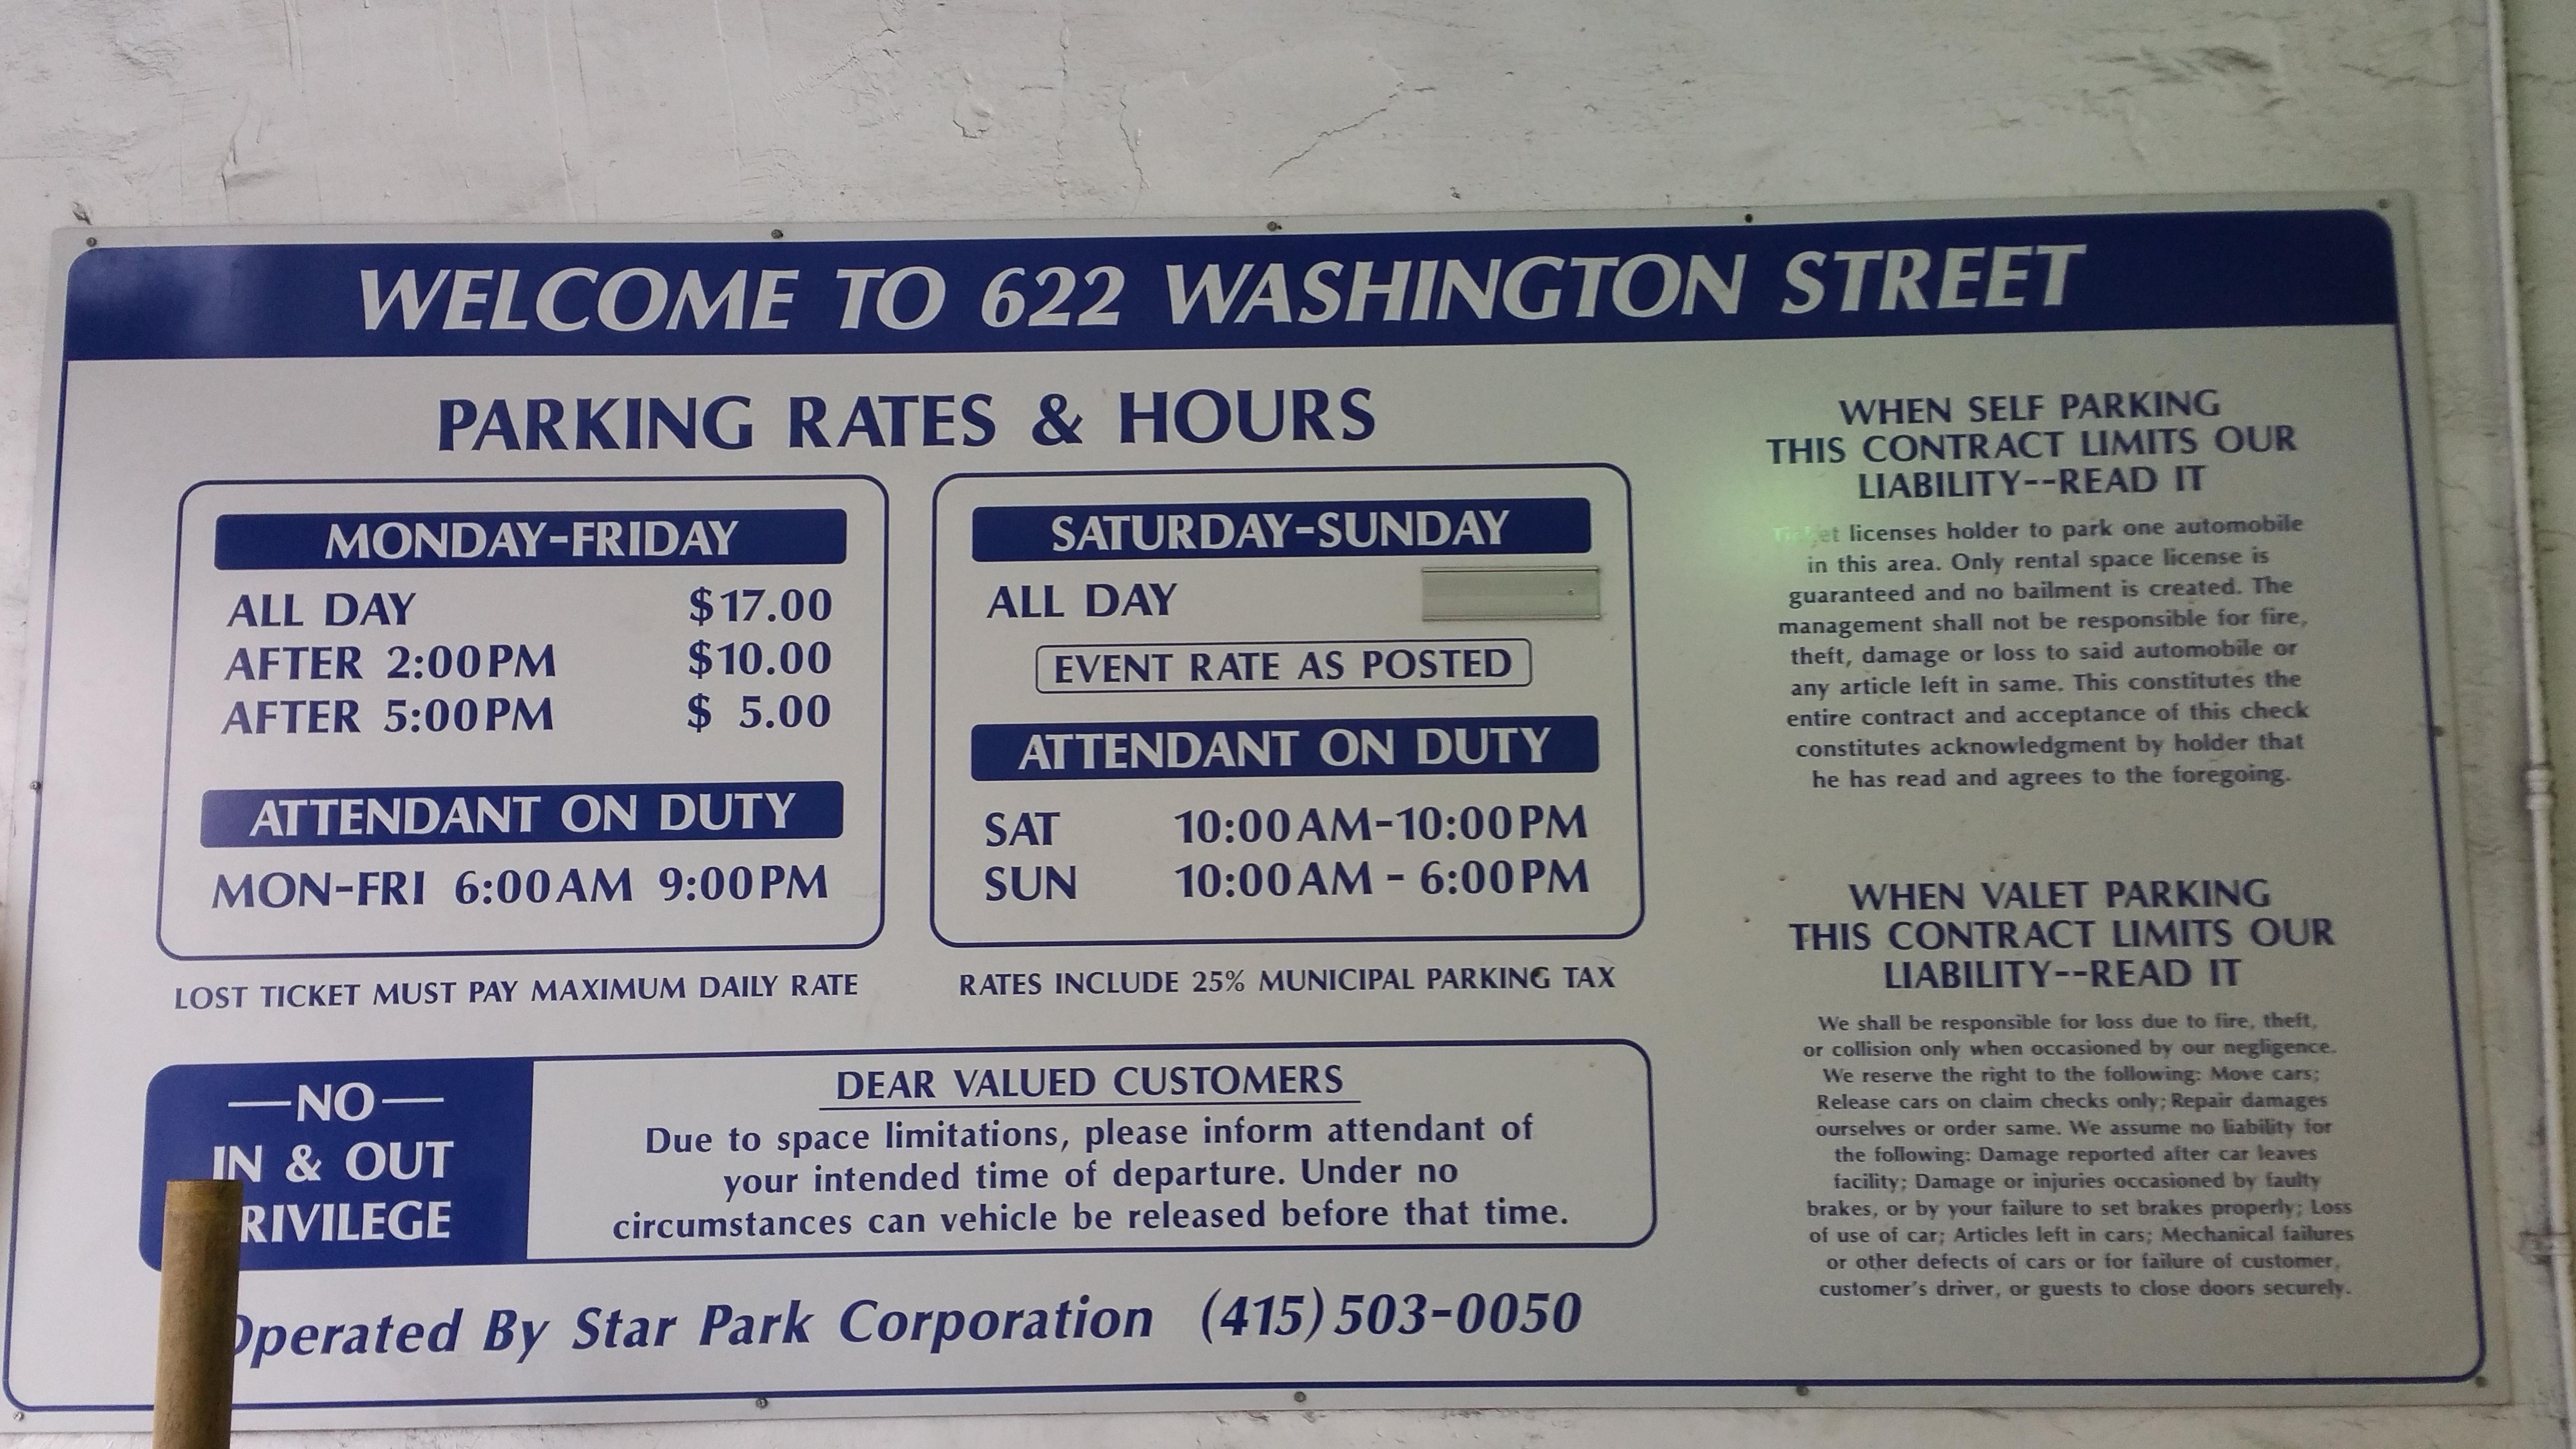 622 Washington St Garage Parking In San Francisco Parkme